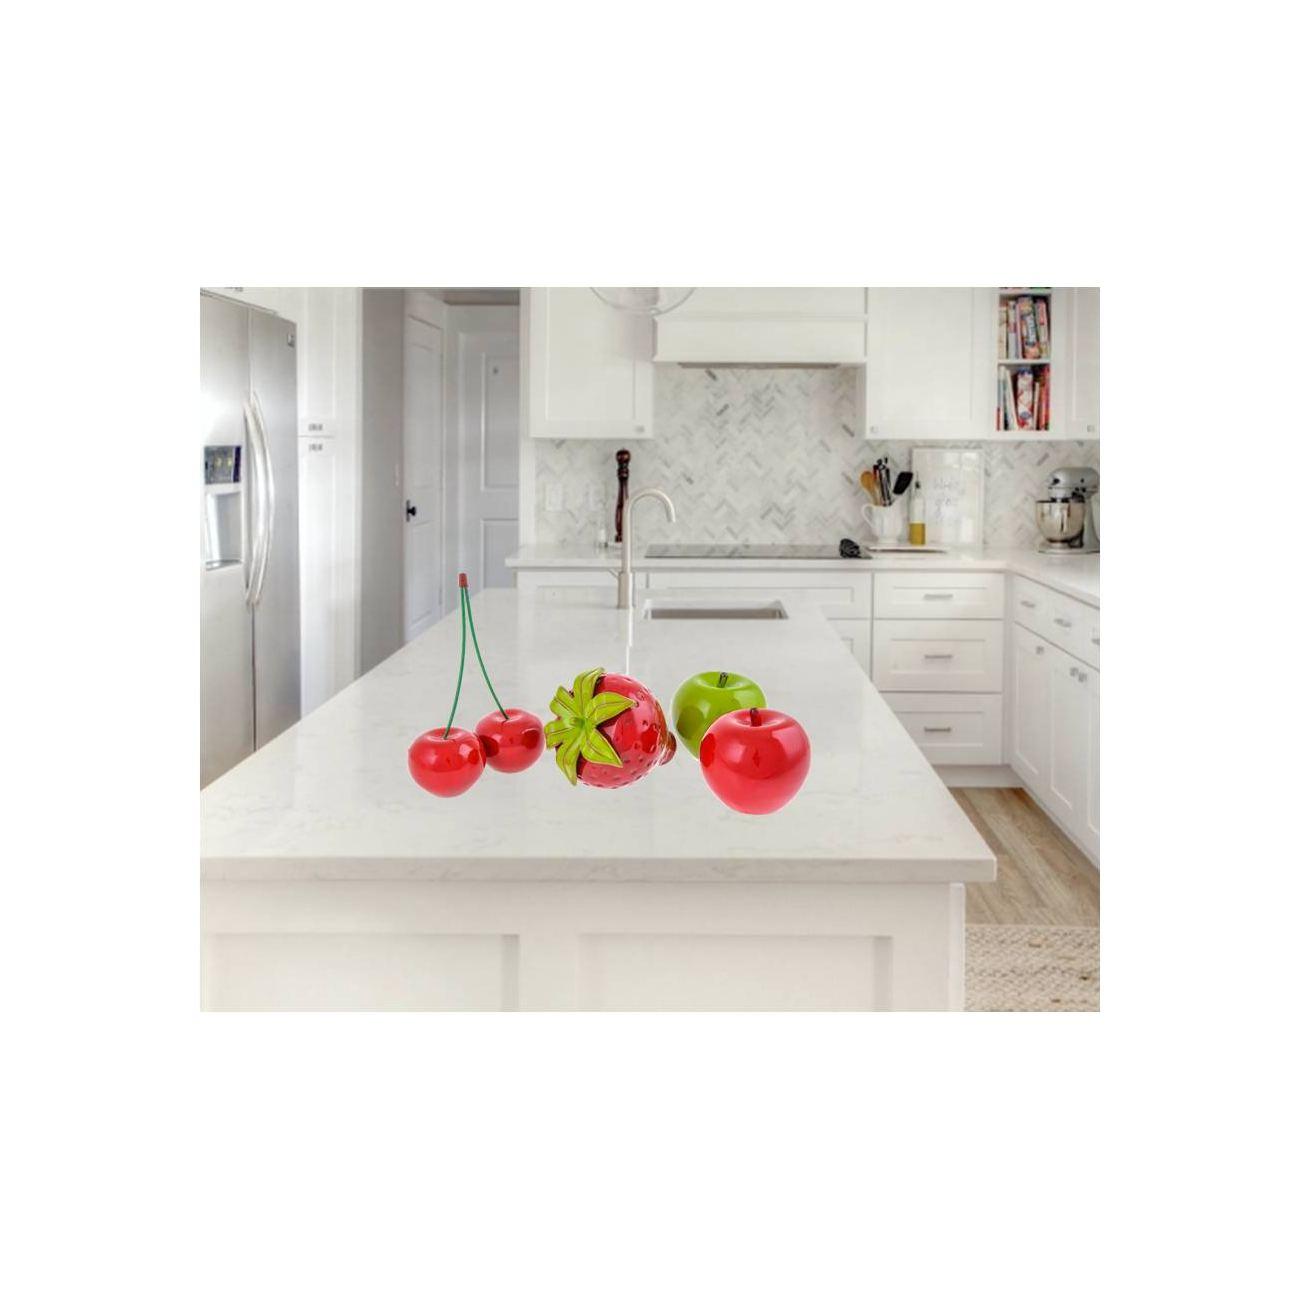 Fruit Ornament Set Of 4 Modern Handmade Ceramic Decor Large